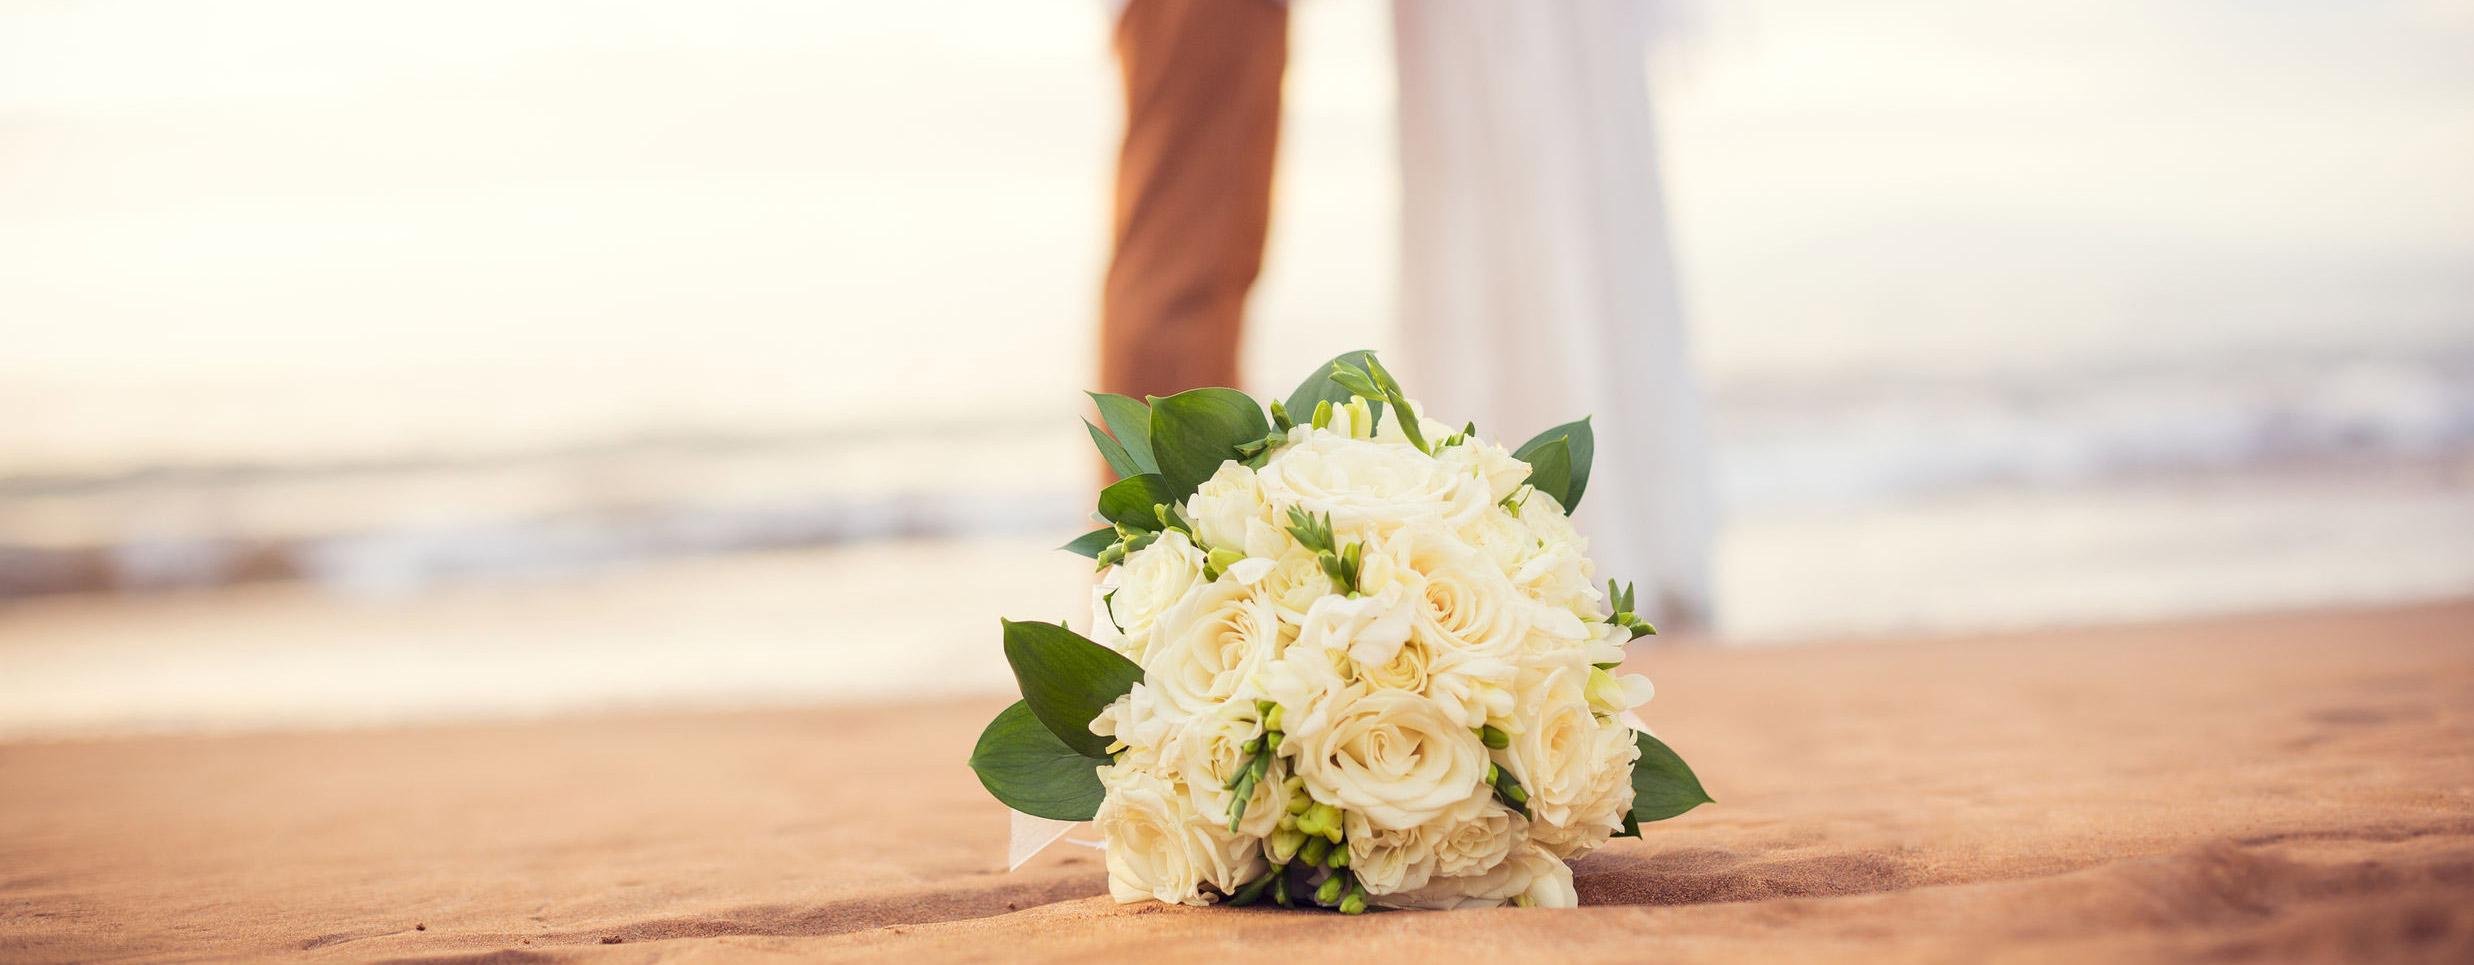 Liste nozze con Fedesign, Genova